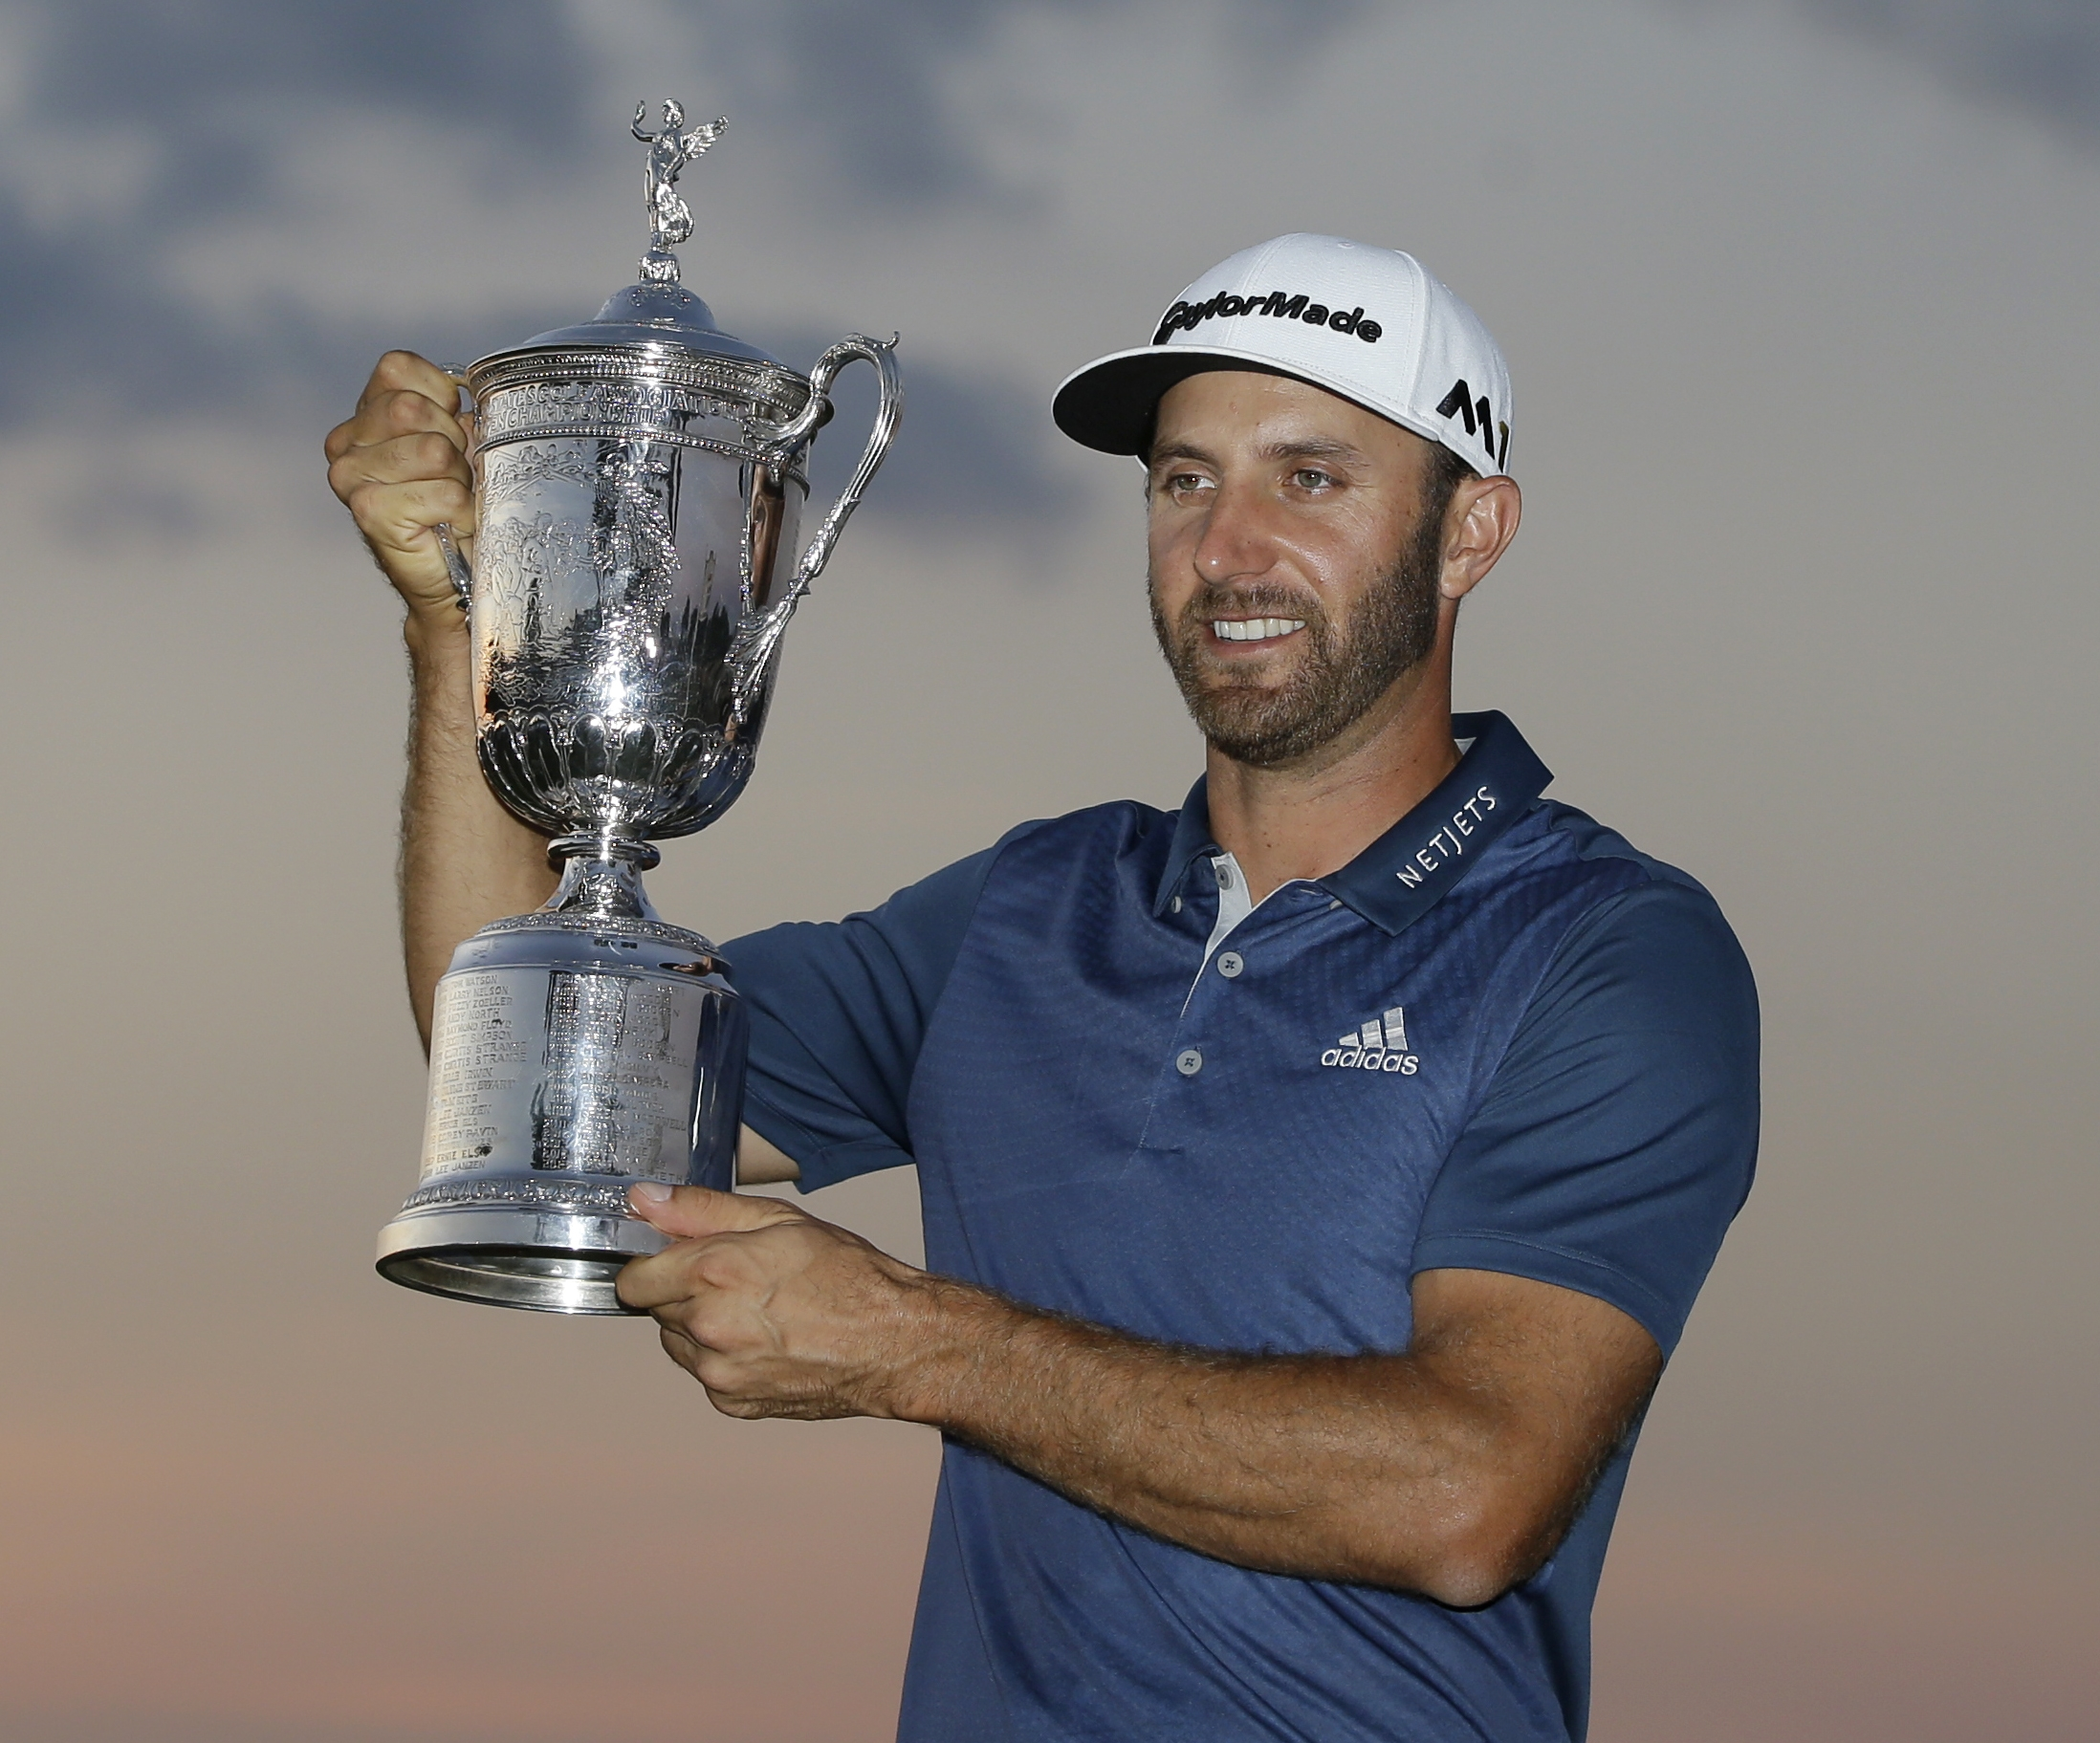 Dustin Johnson holds the trophy after winning the U.S. Open golf championship at Oakmont Country Club on Sunday, June 19, 2016, in Oakmont, Pa. (AP Photo/John Minchillo)